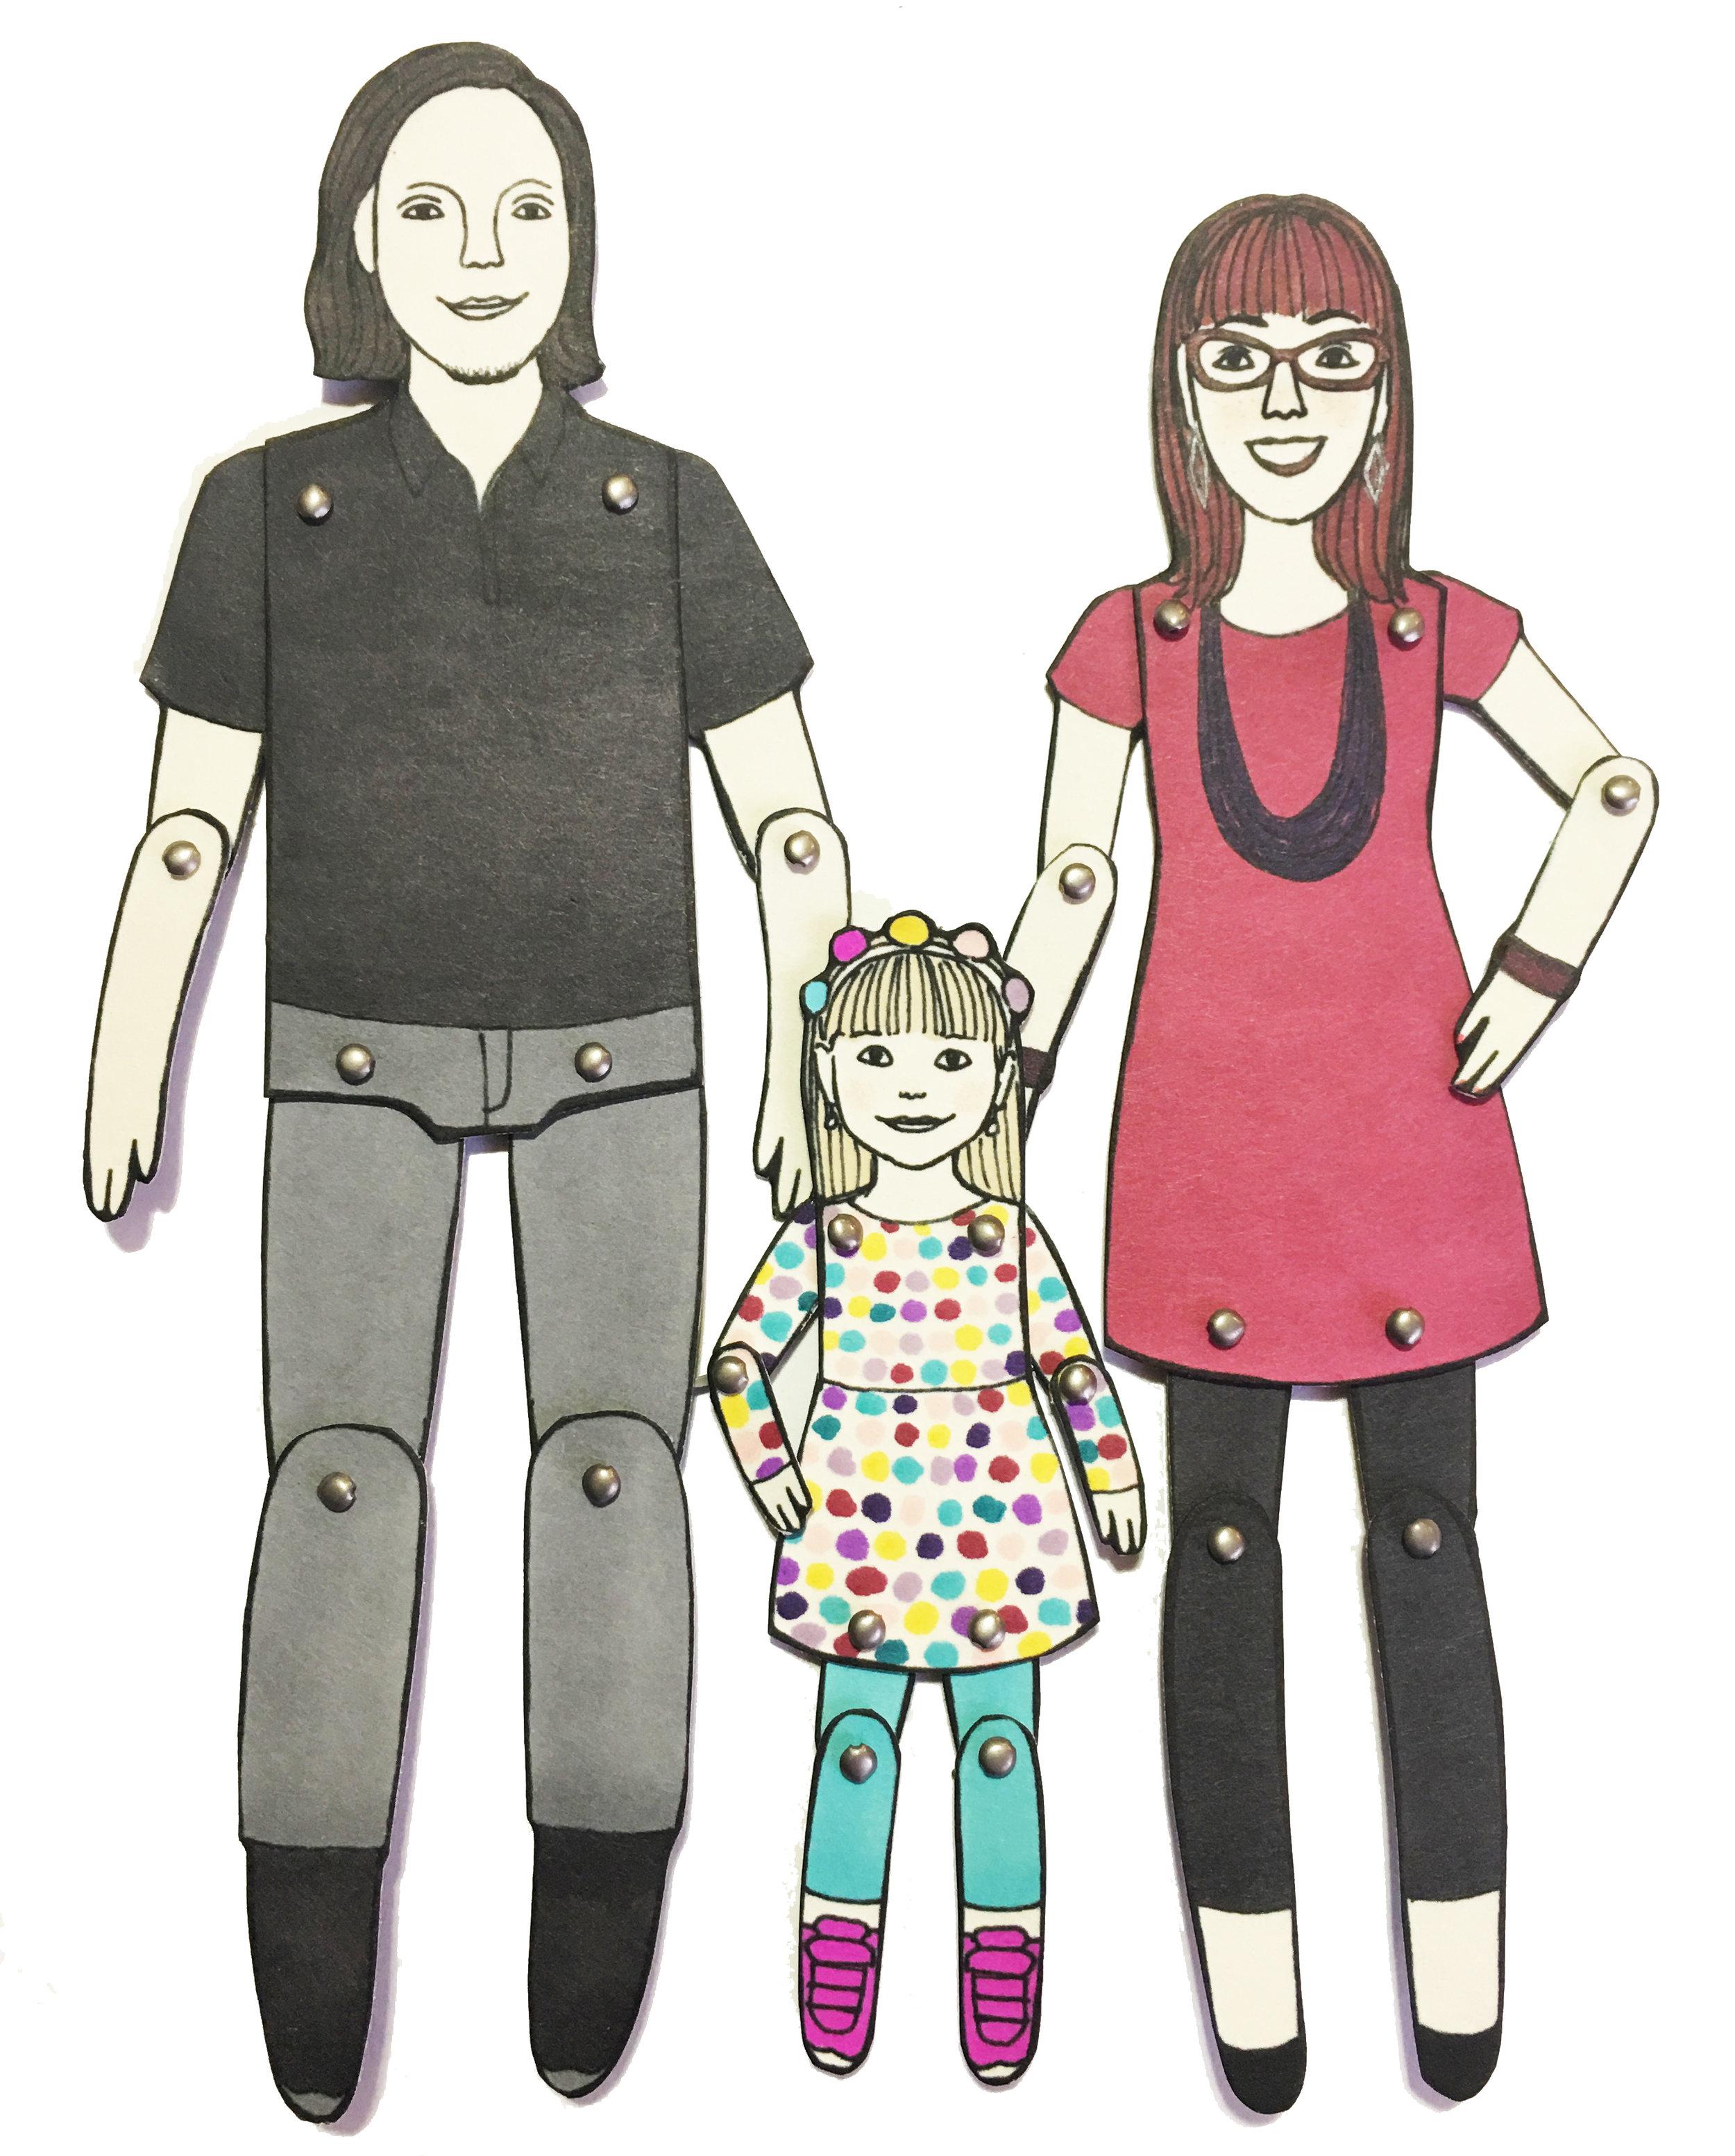 Family Portrait by Jordan Grace Owens